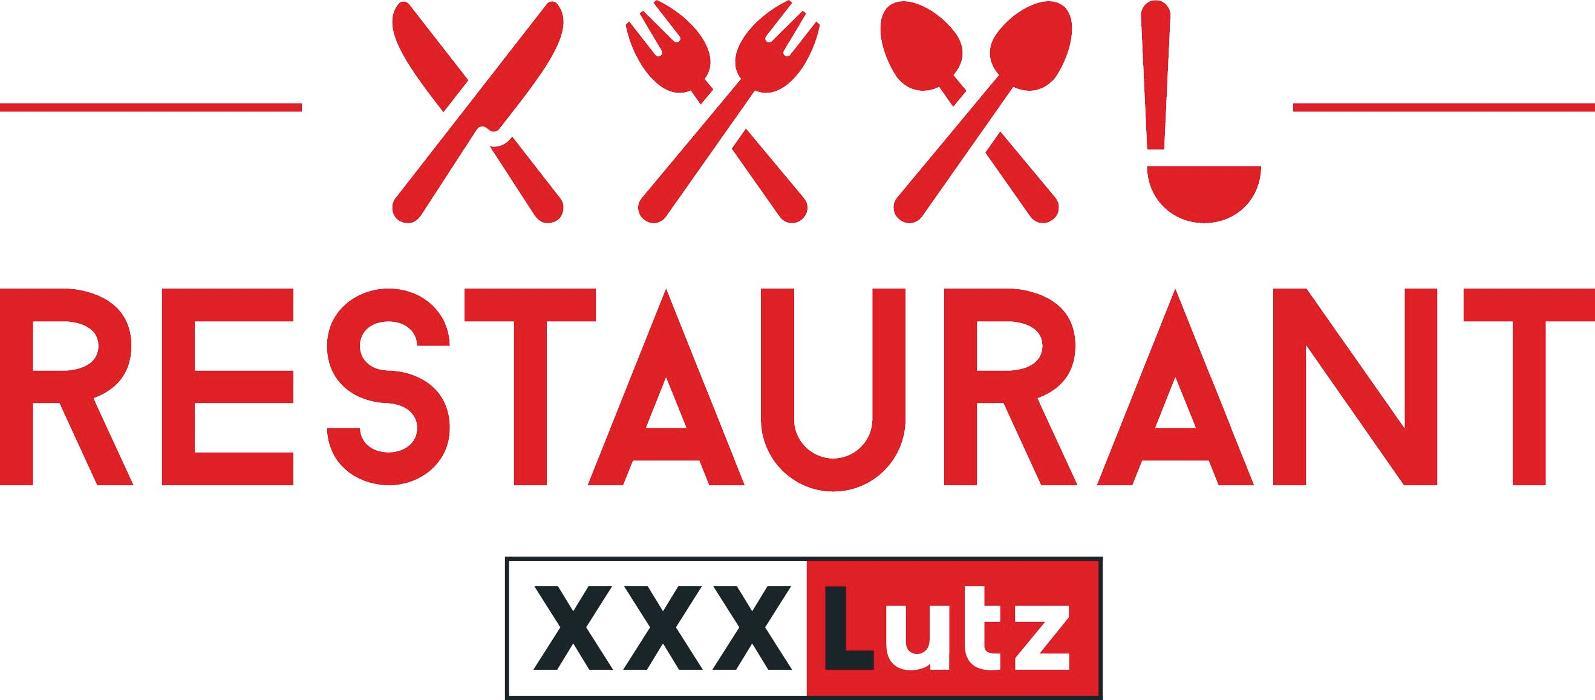 Xxxlutz Restaurant Wien 22 Wien Wagramer Straße 248